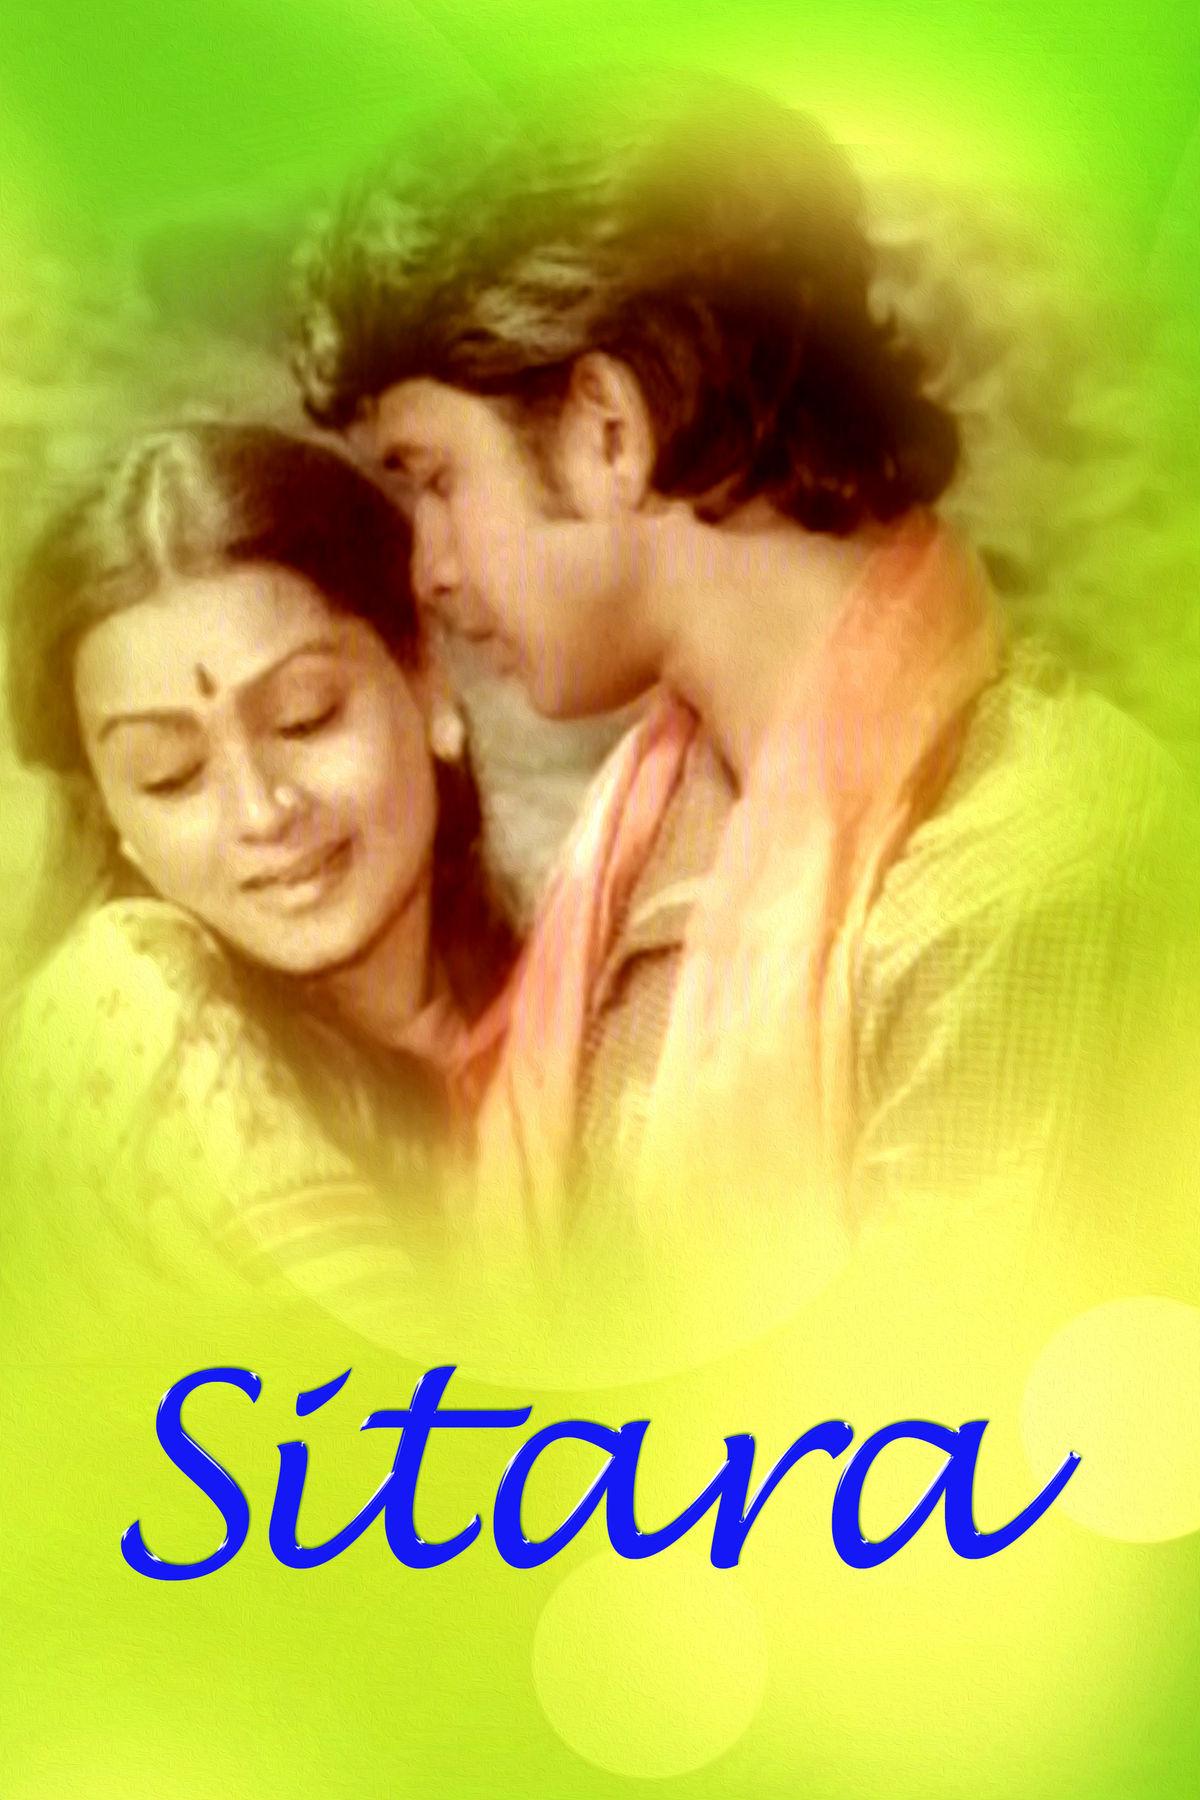 Meraj Best Movies, TV Shows and Web Series List